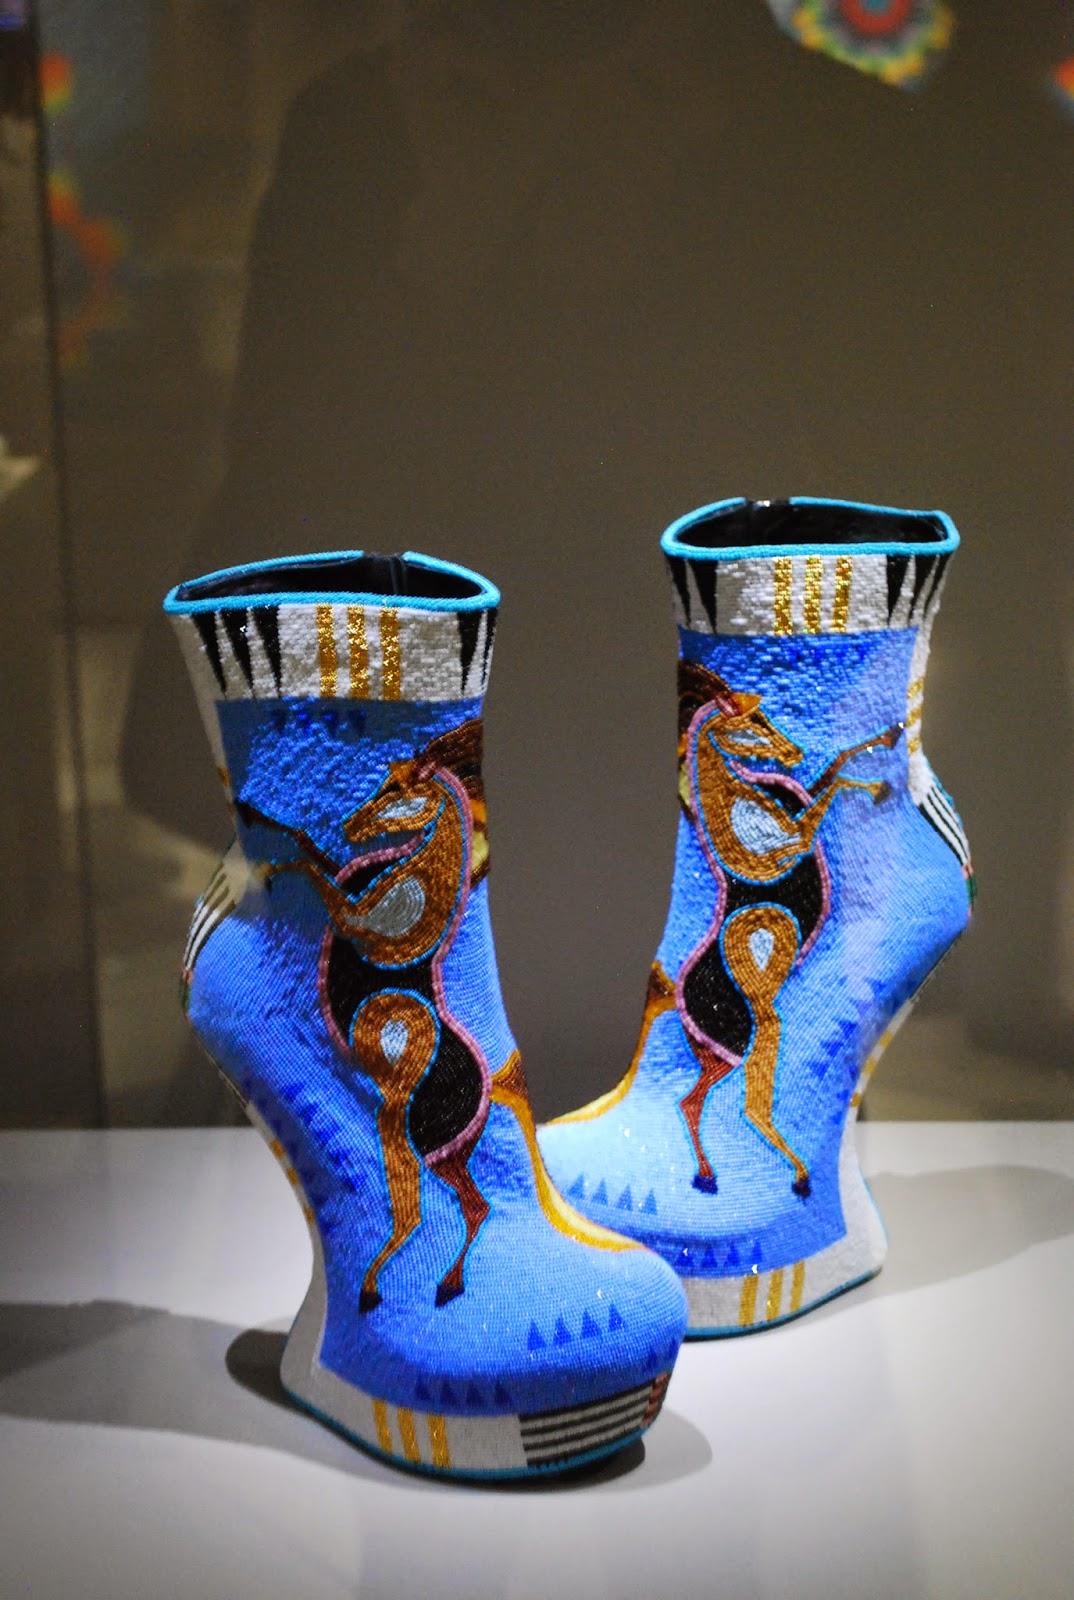 J. Okuma, Chaussures sabots, 2014